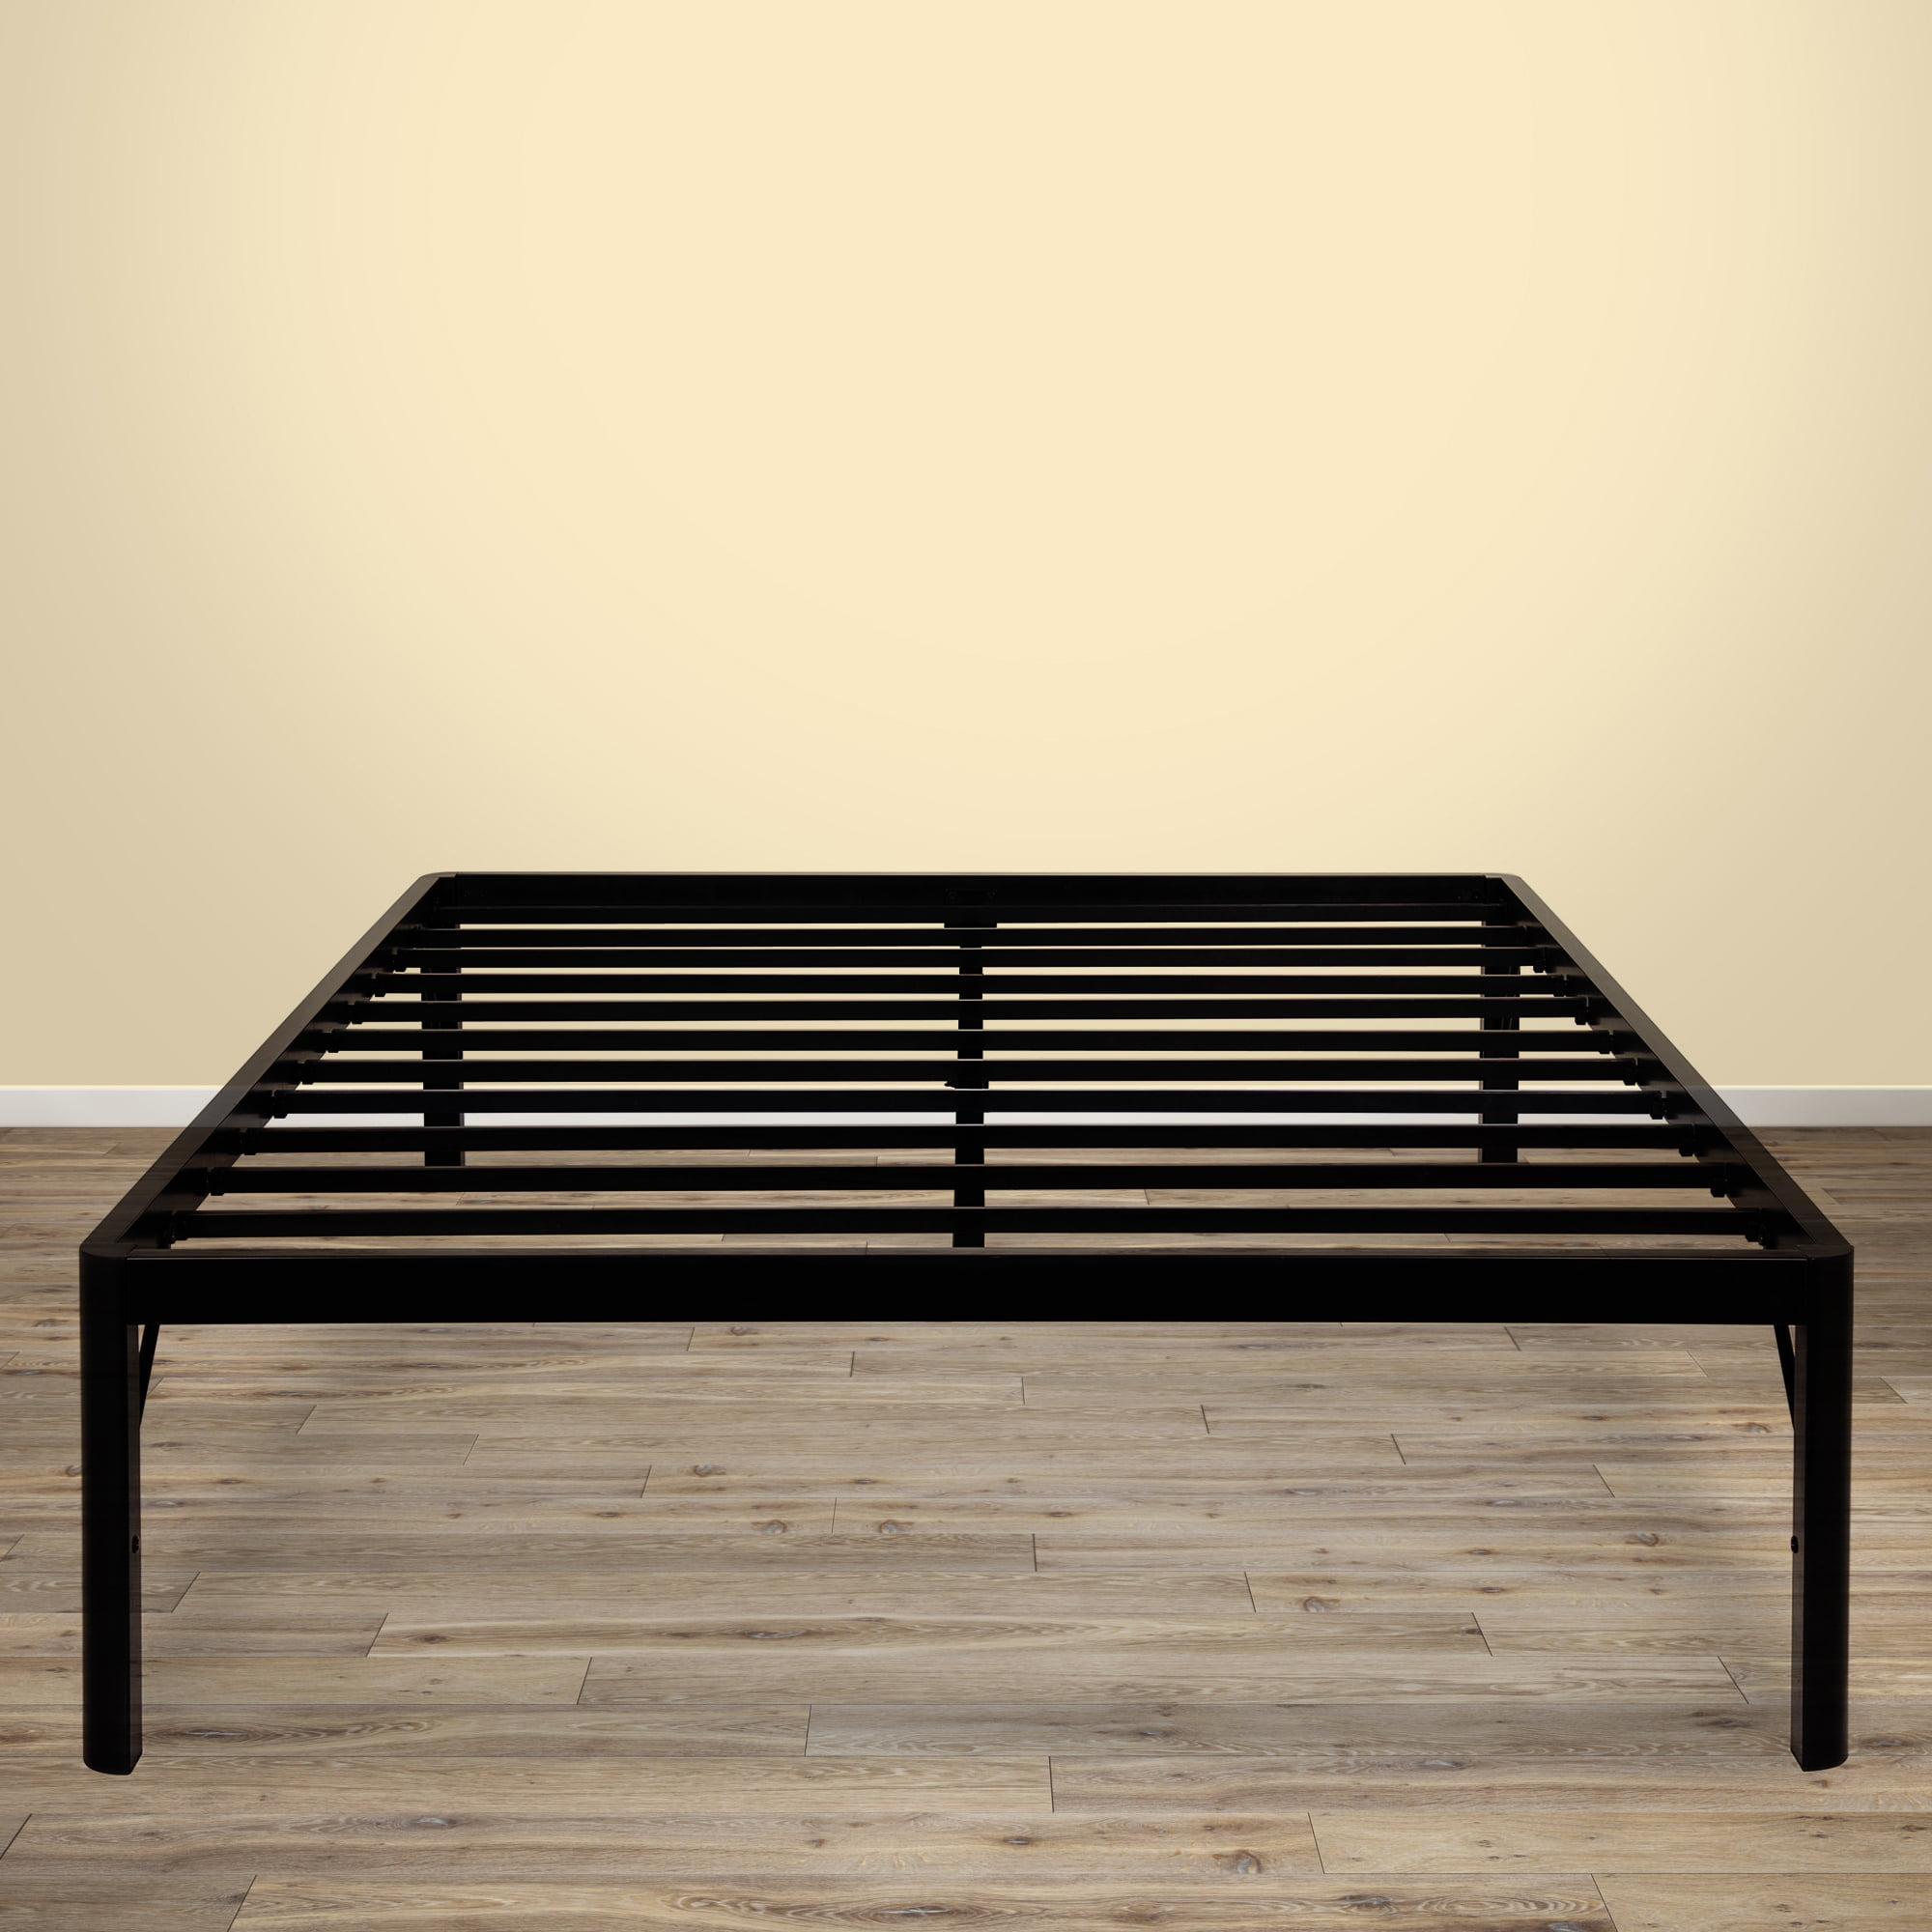 granrest 18 inch tall round edge platform metal bed frame with steel slat grs 3500 - Steel Frame Bed